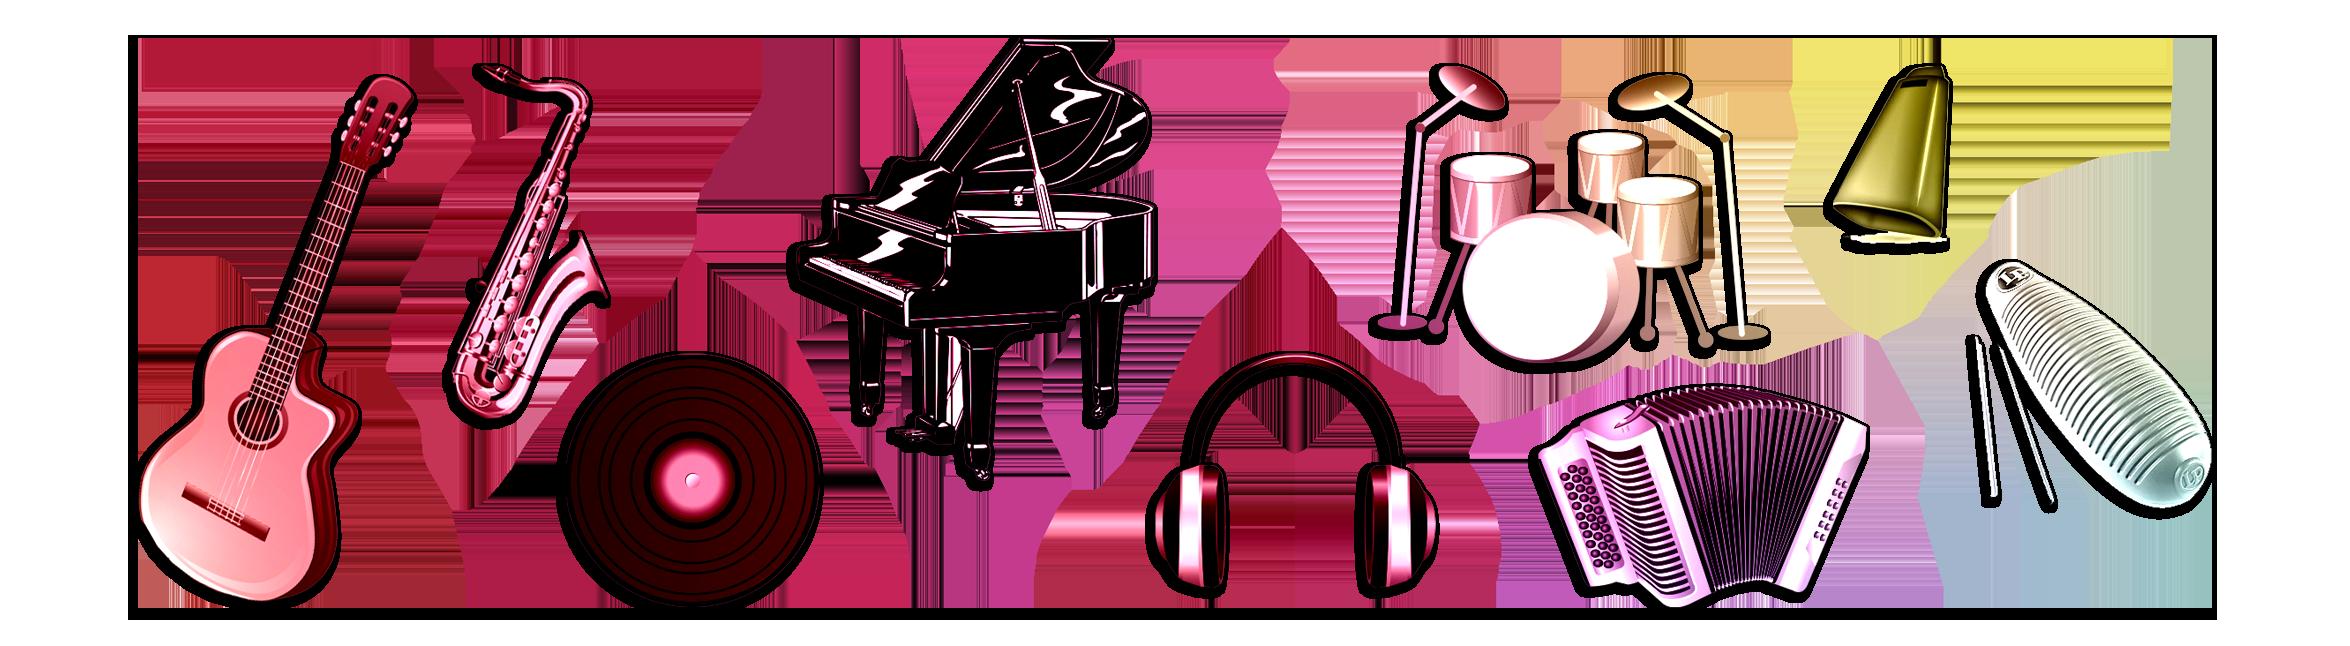 instrumentosTop